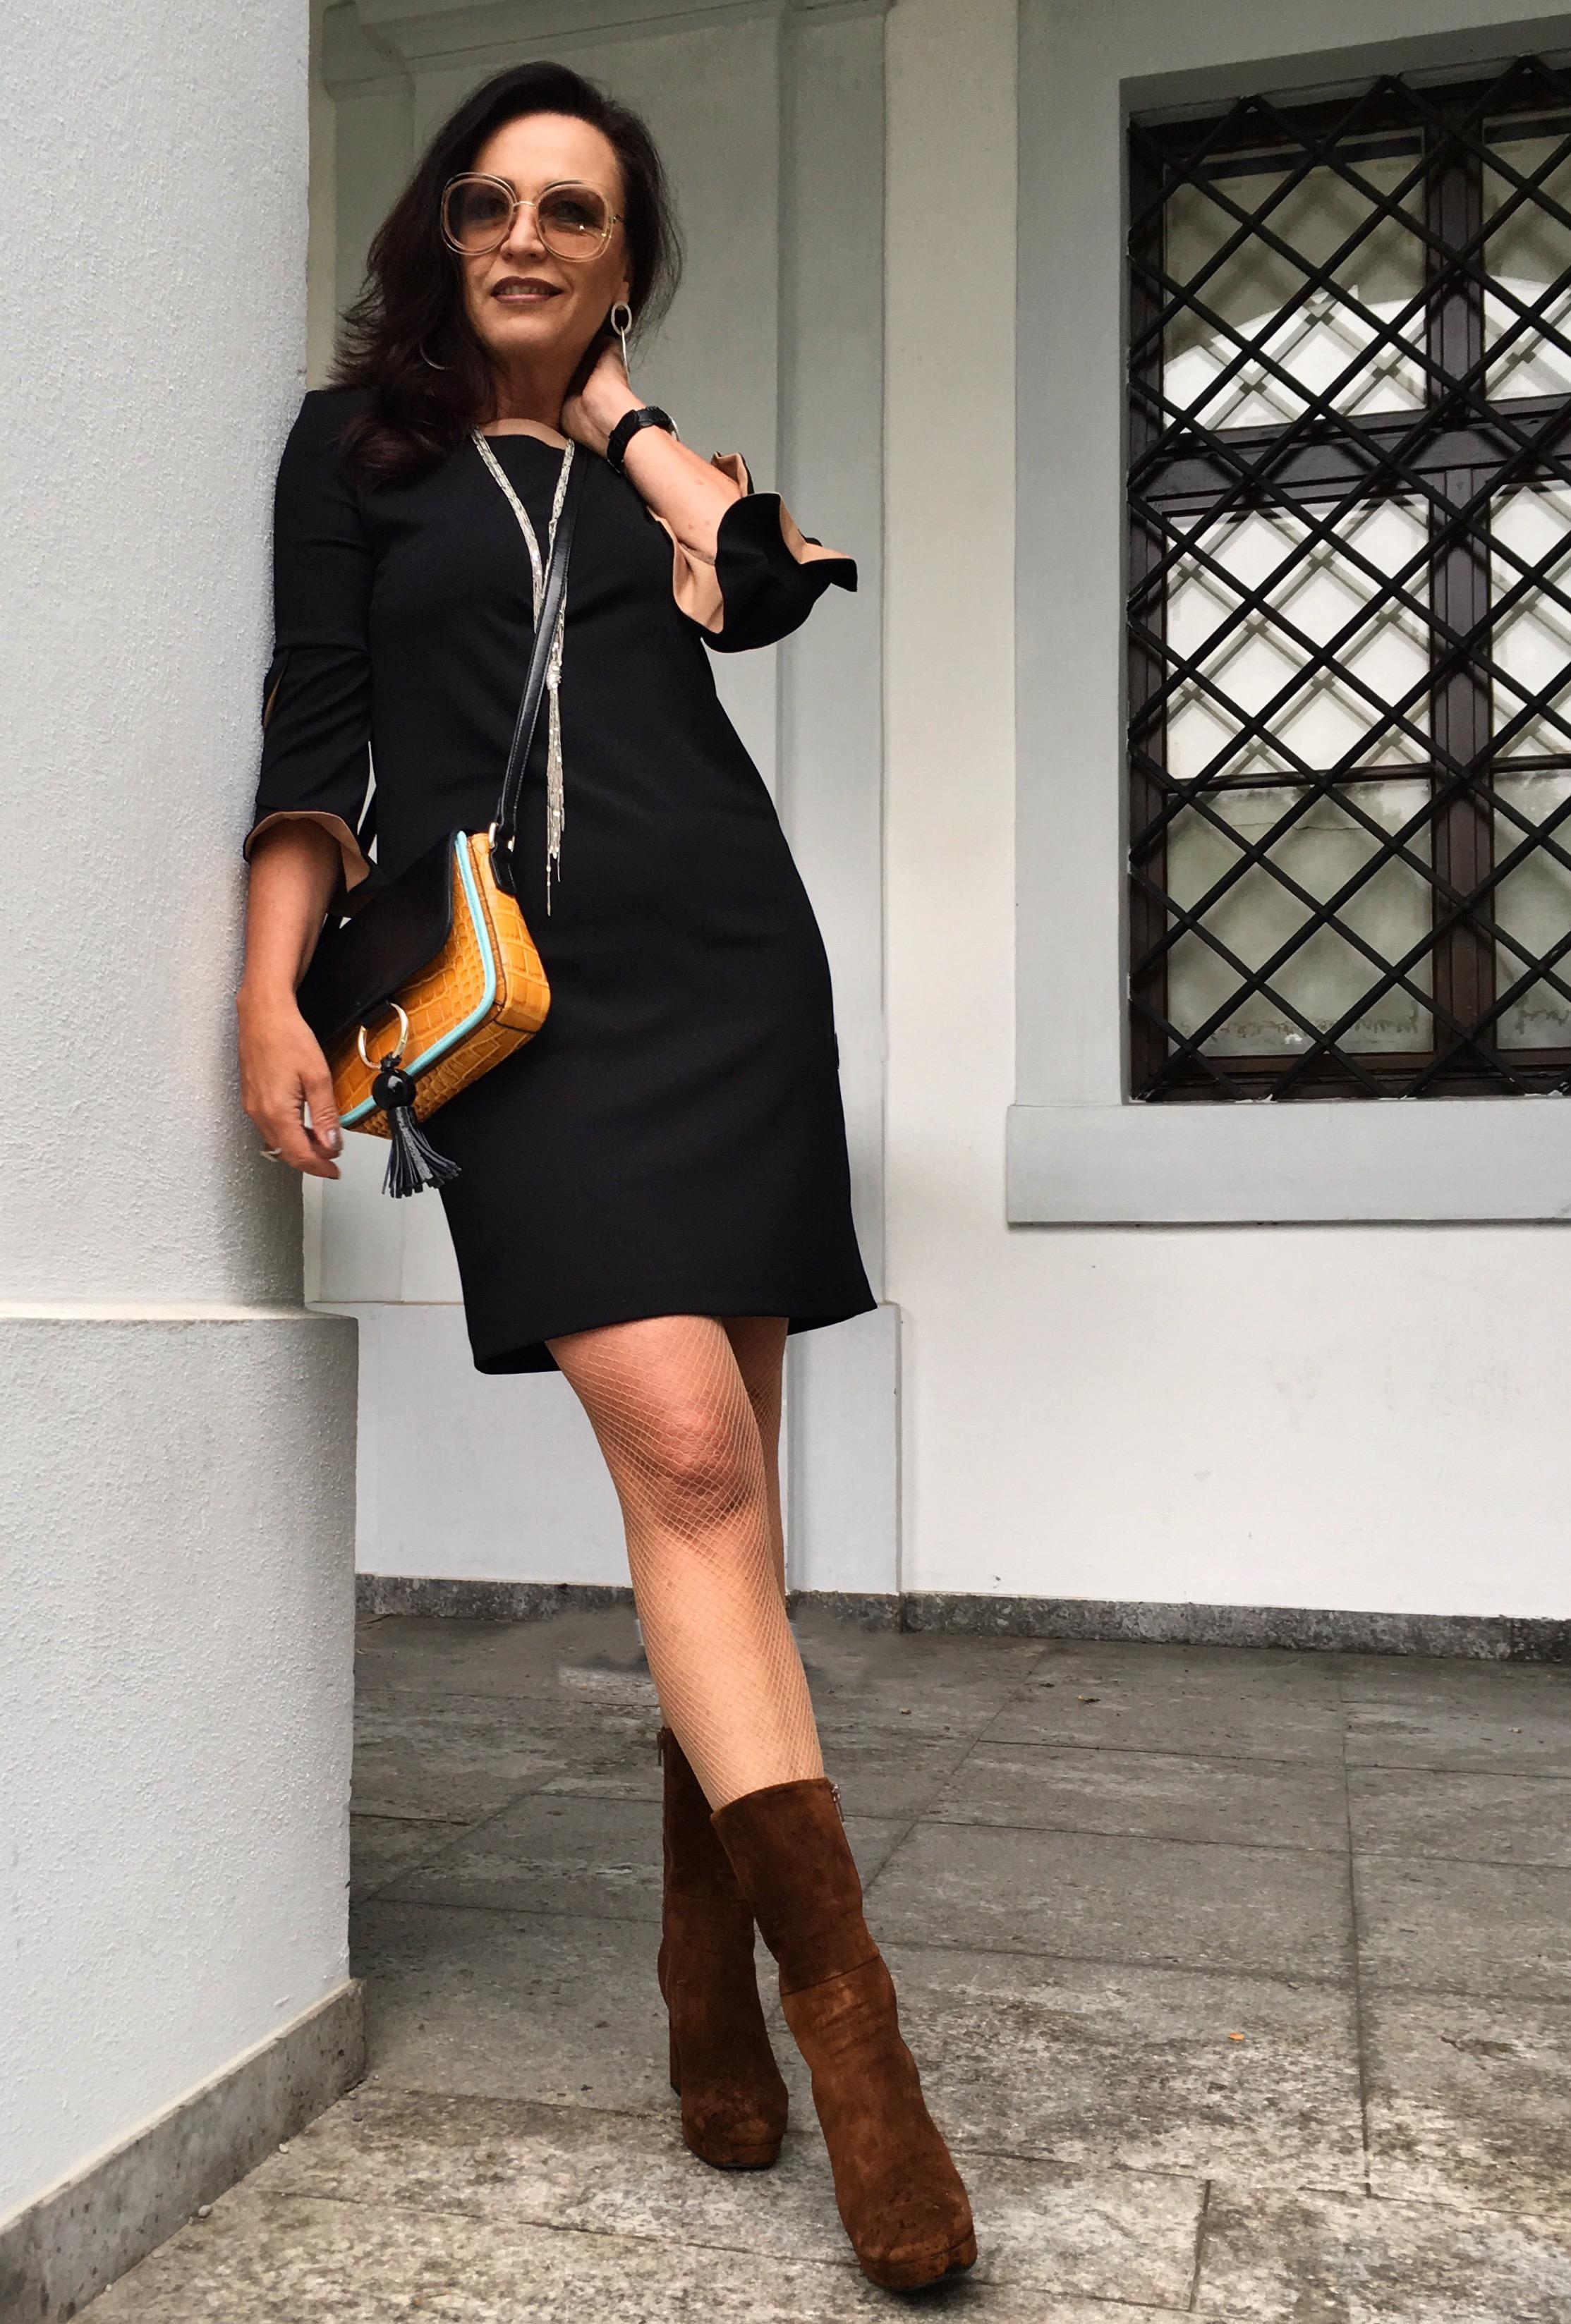 chloe, sandro ferrone, rizzolli, Fashion, Fashionblog, moda, mode, blogpost